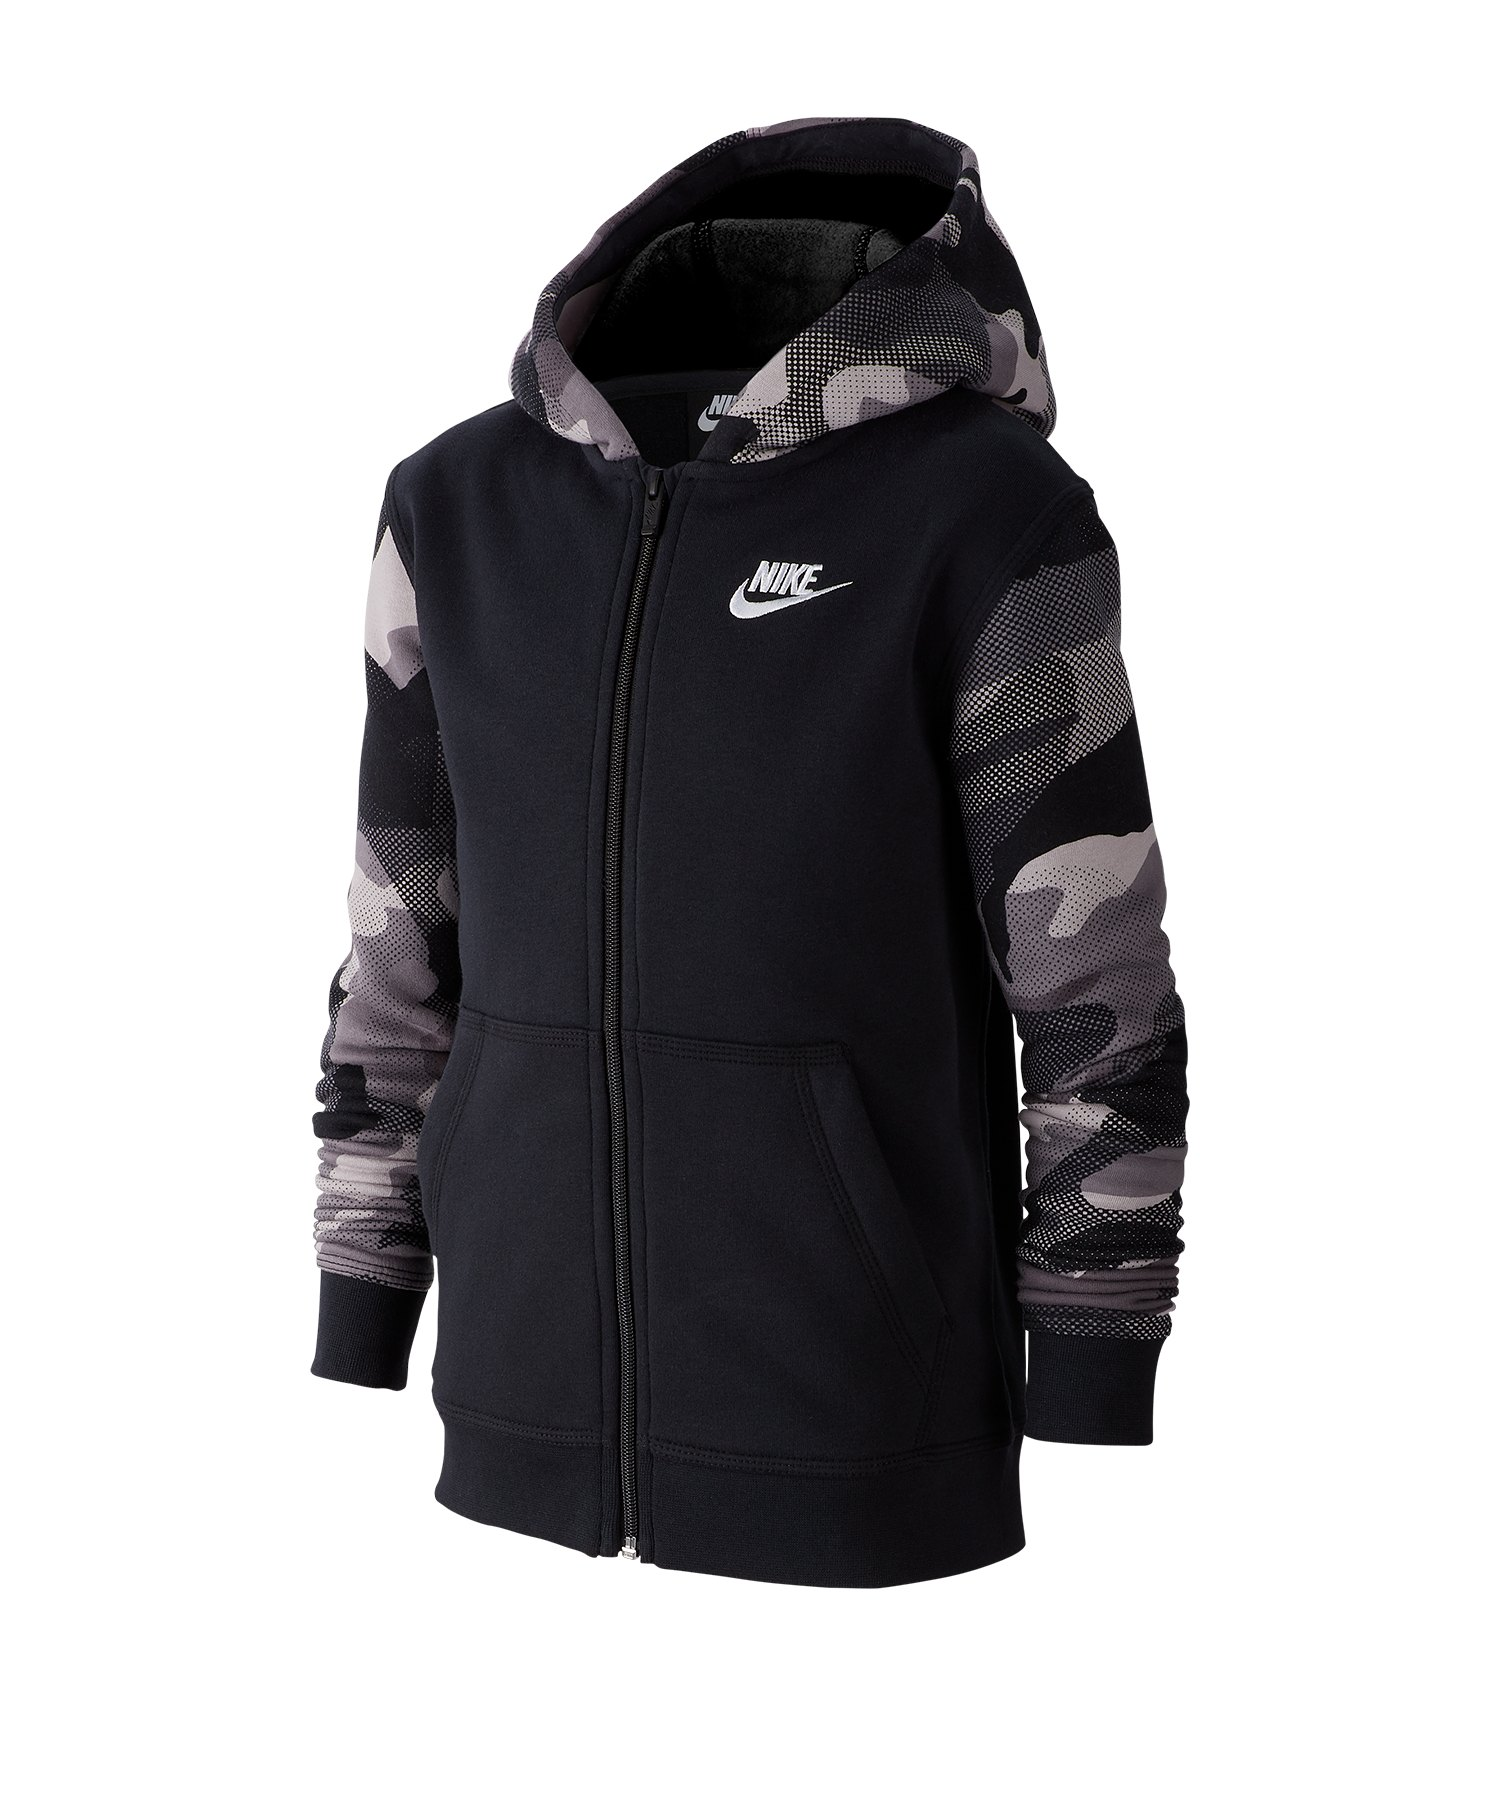 Nike Full-Zip Kapuzenjacke Kids Schwarz F010 - schwarz